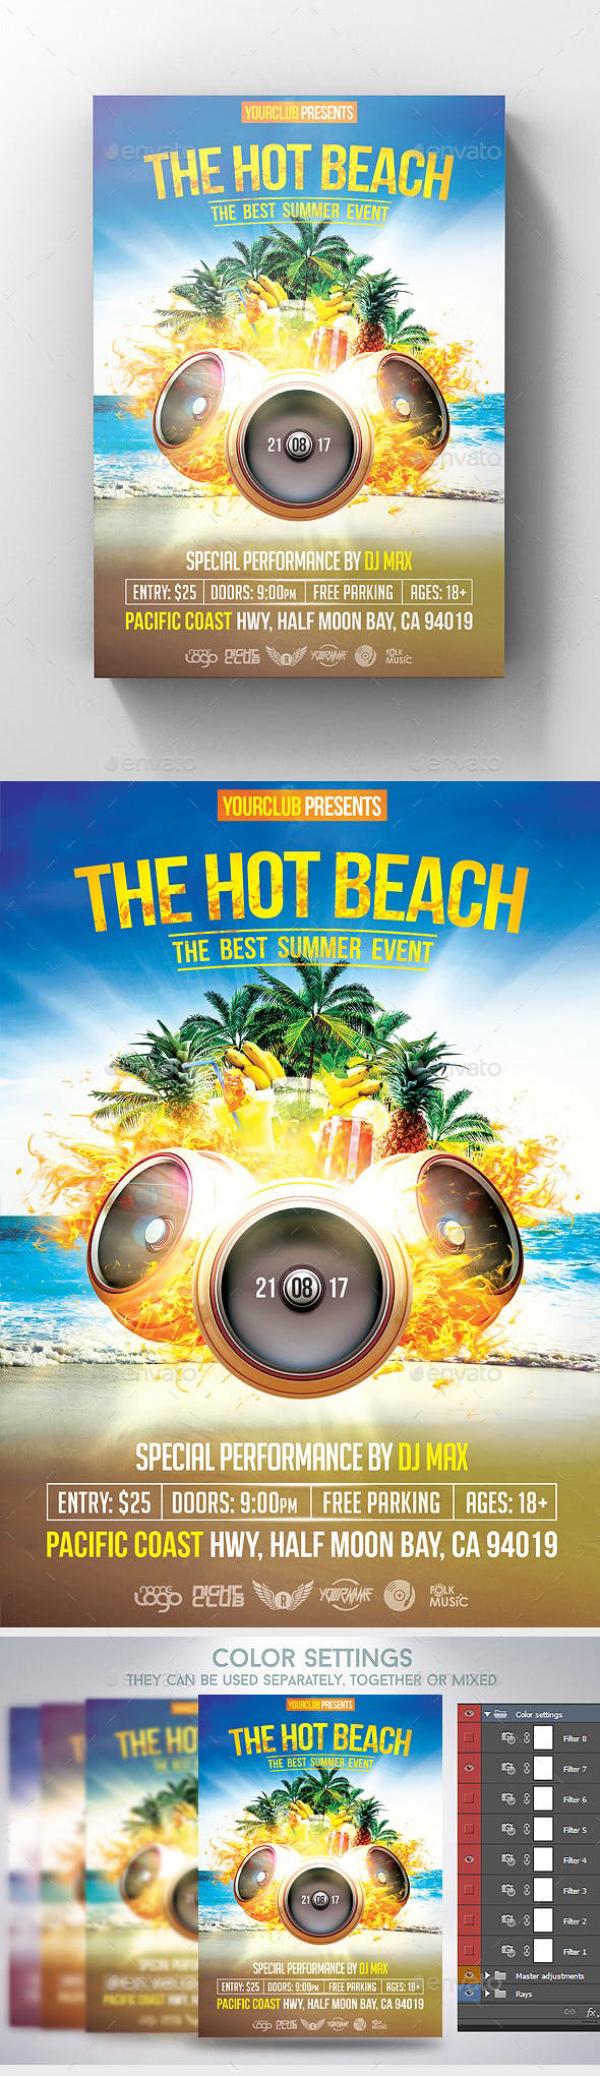 the hot beach flyer